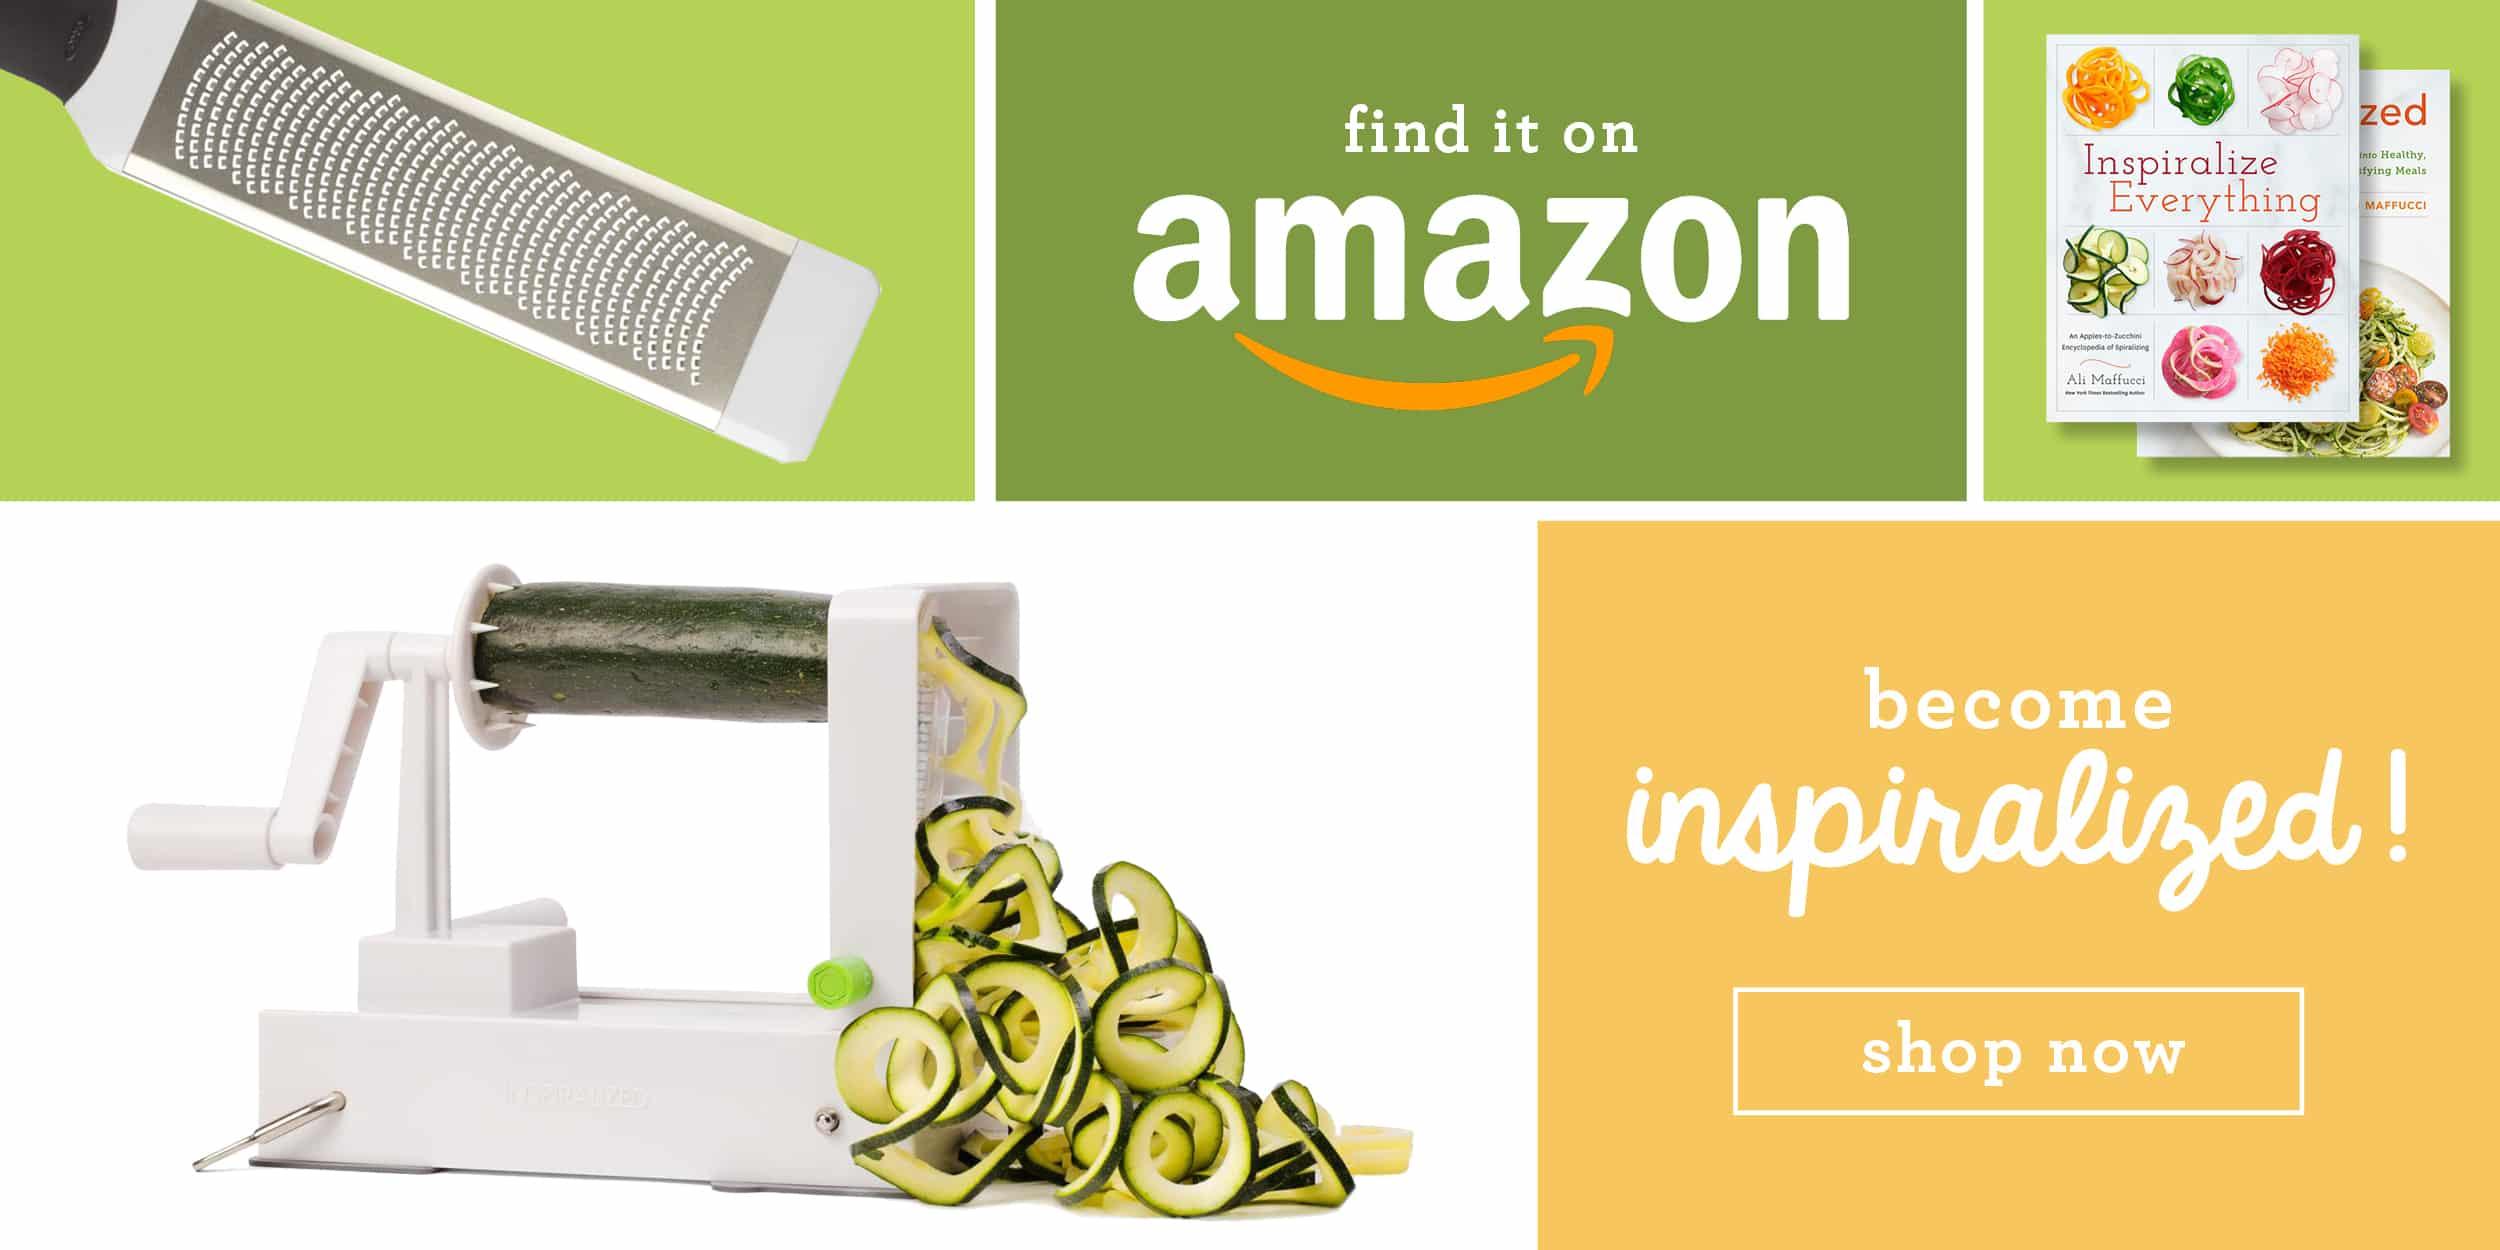 inspiralized_web-ads_available-on-amazon_v22